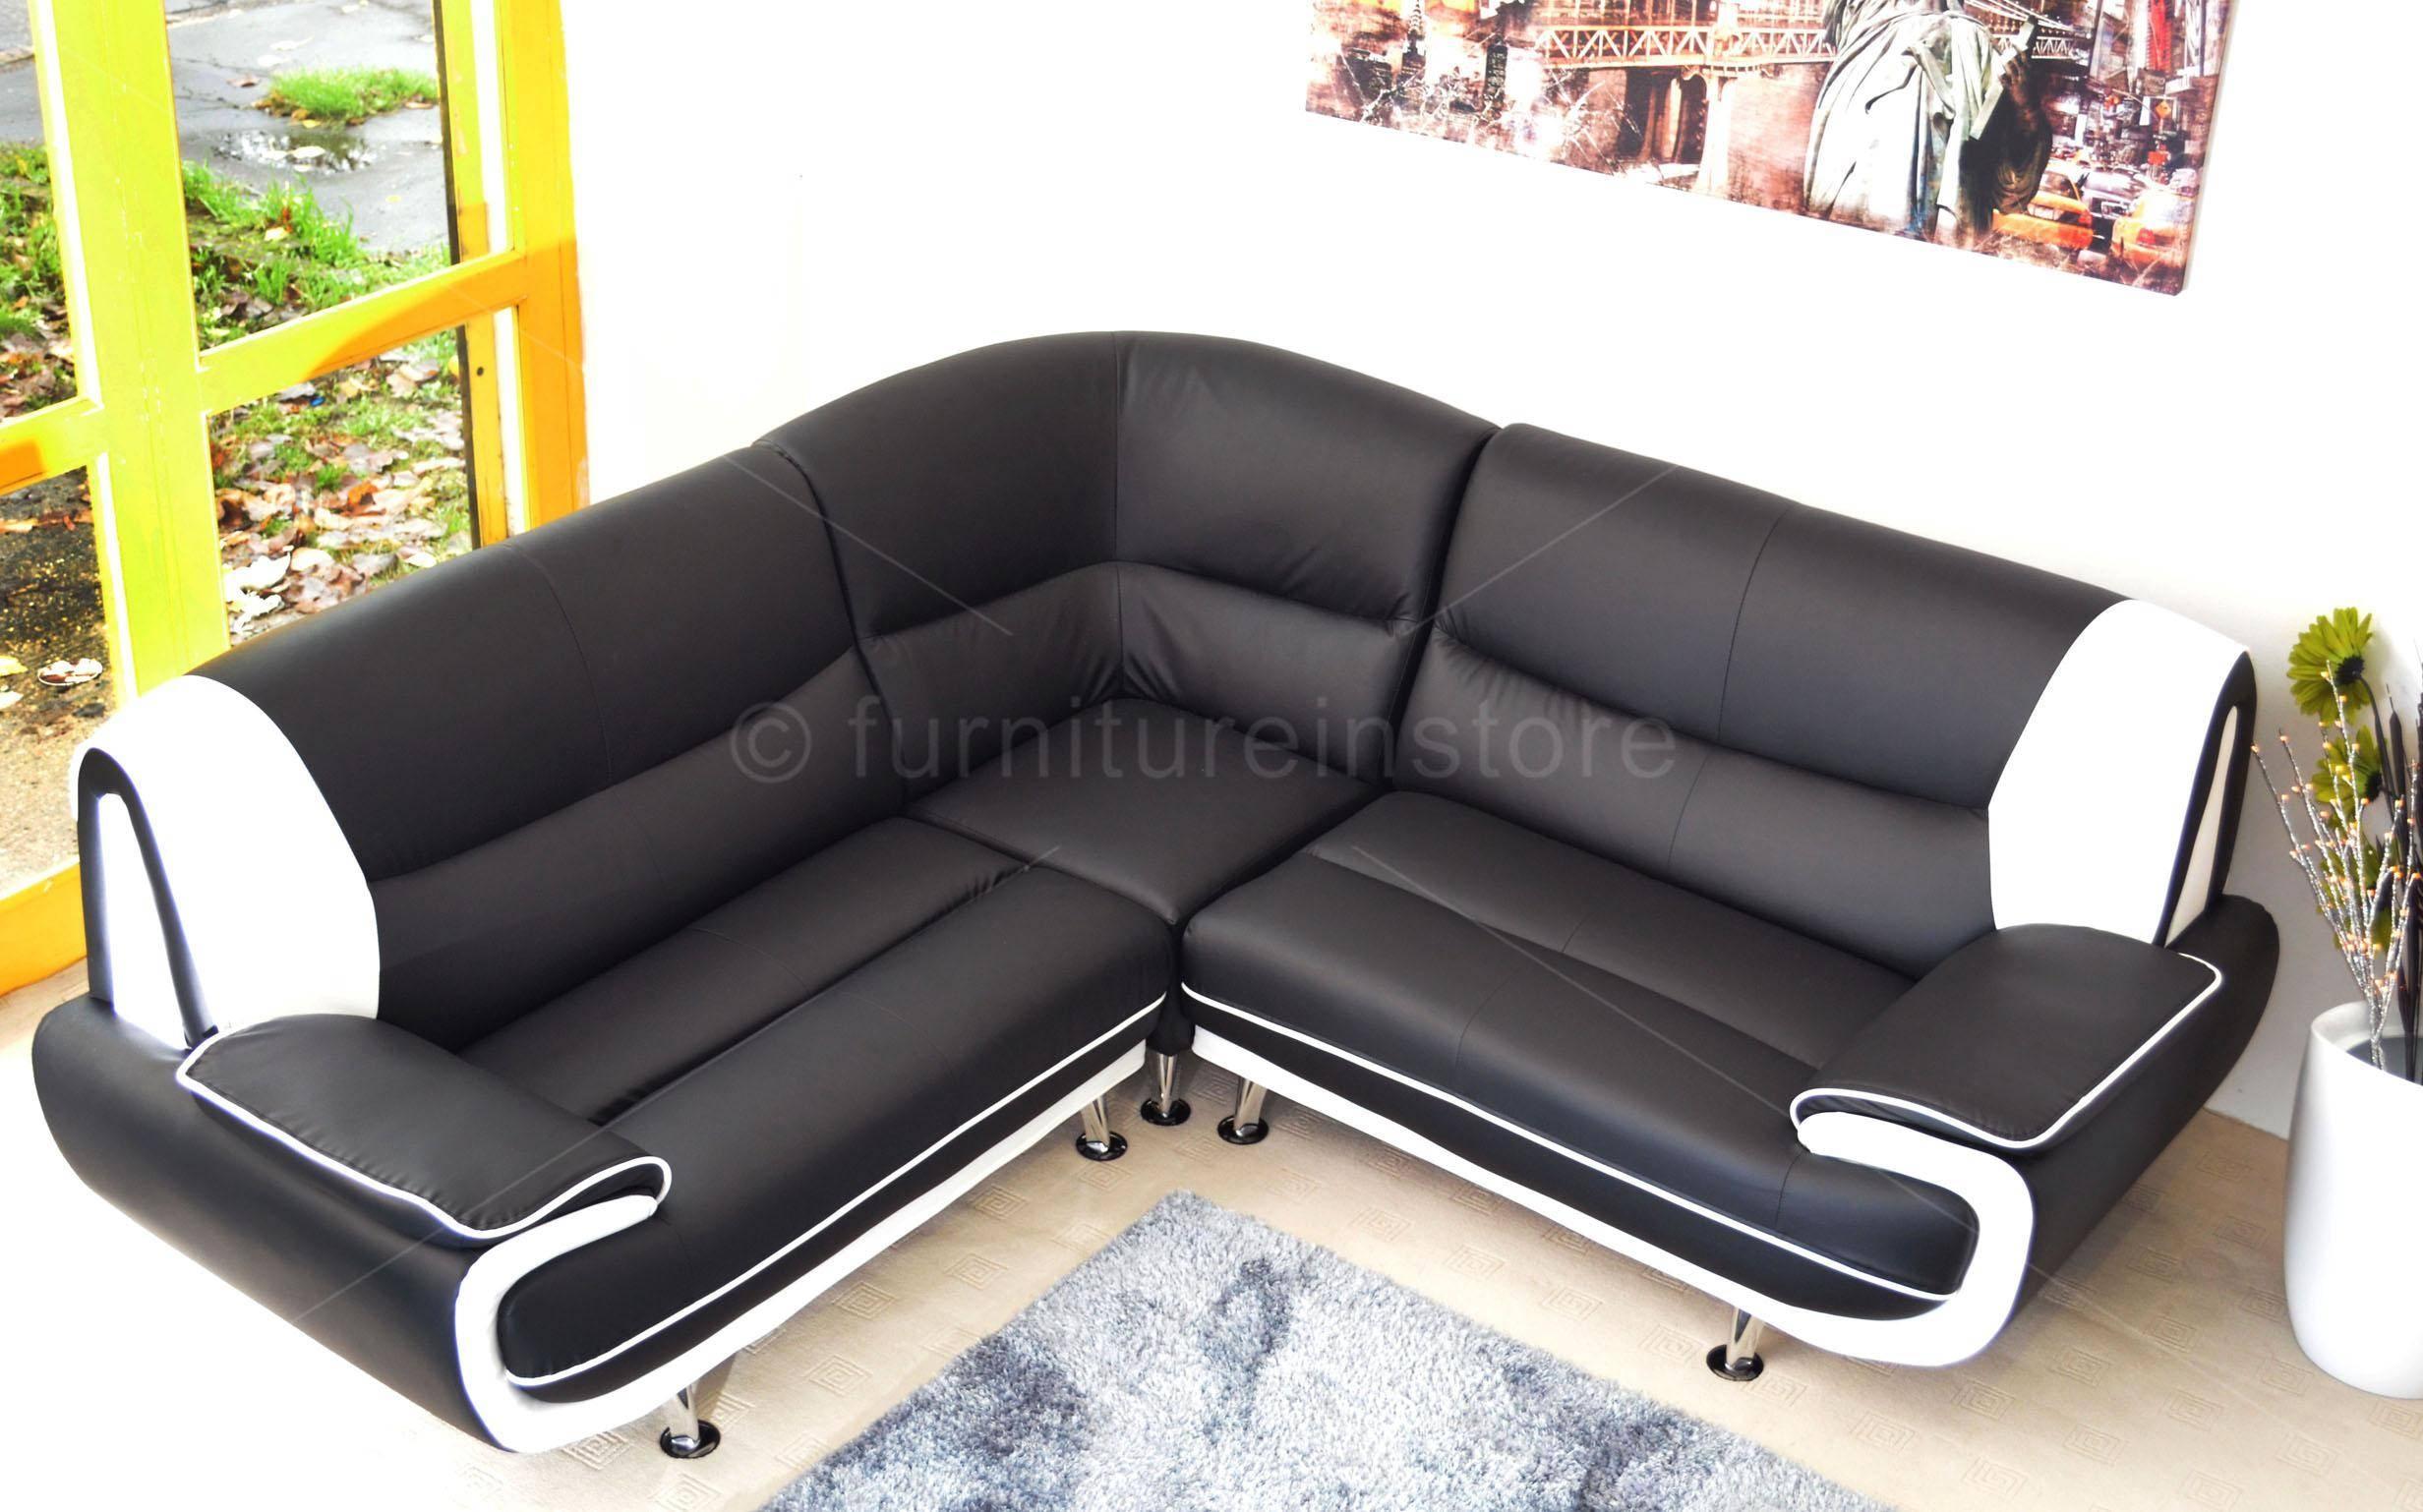 Faux Leather Corner Sofa Sofa Passero Corner Sofas Setttee On Sale for Black Leather Corner Sofas (Image 8 of 15)